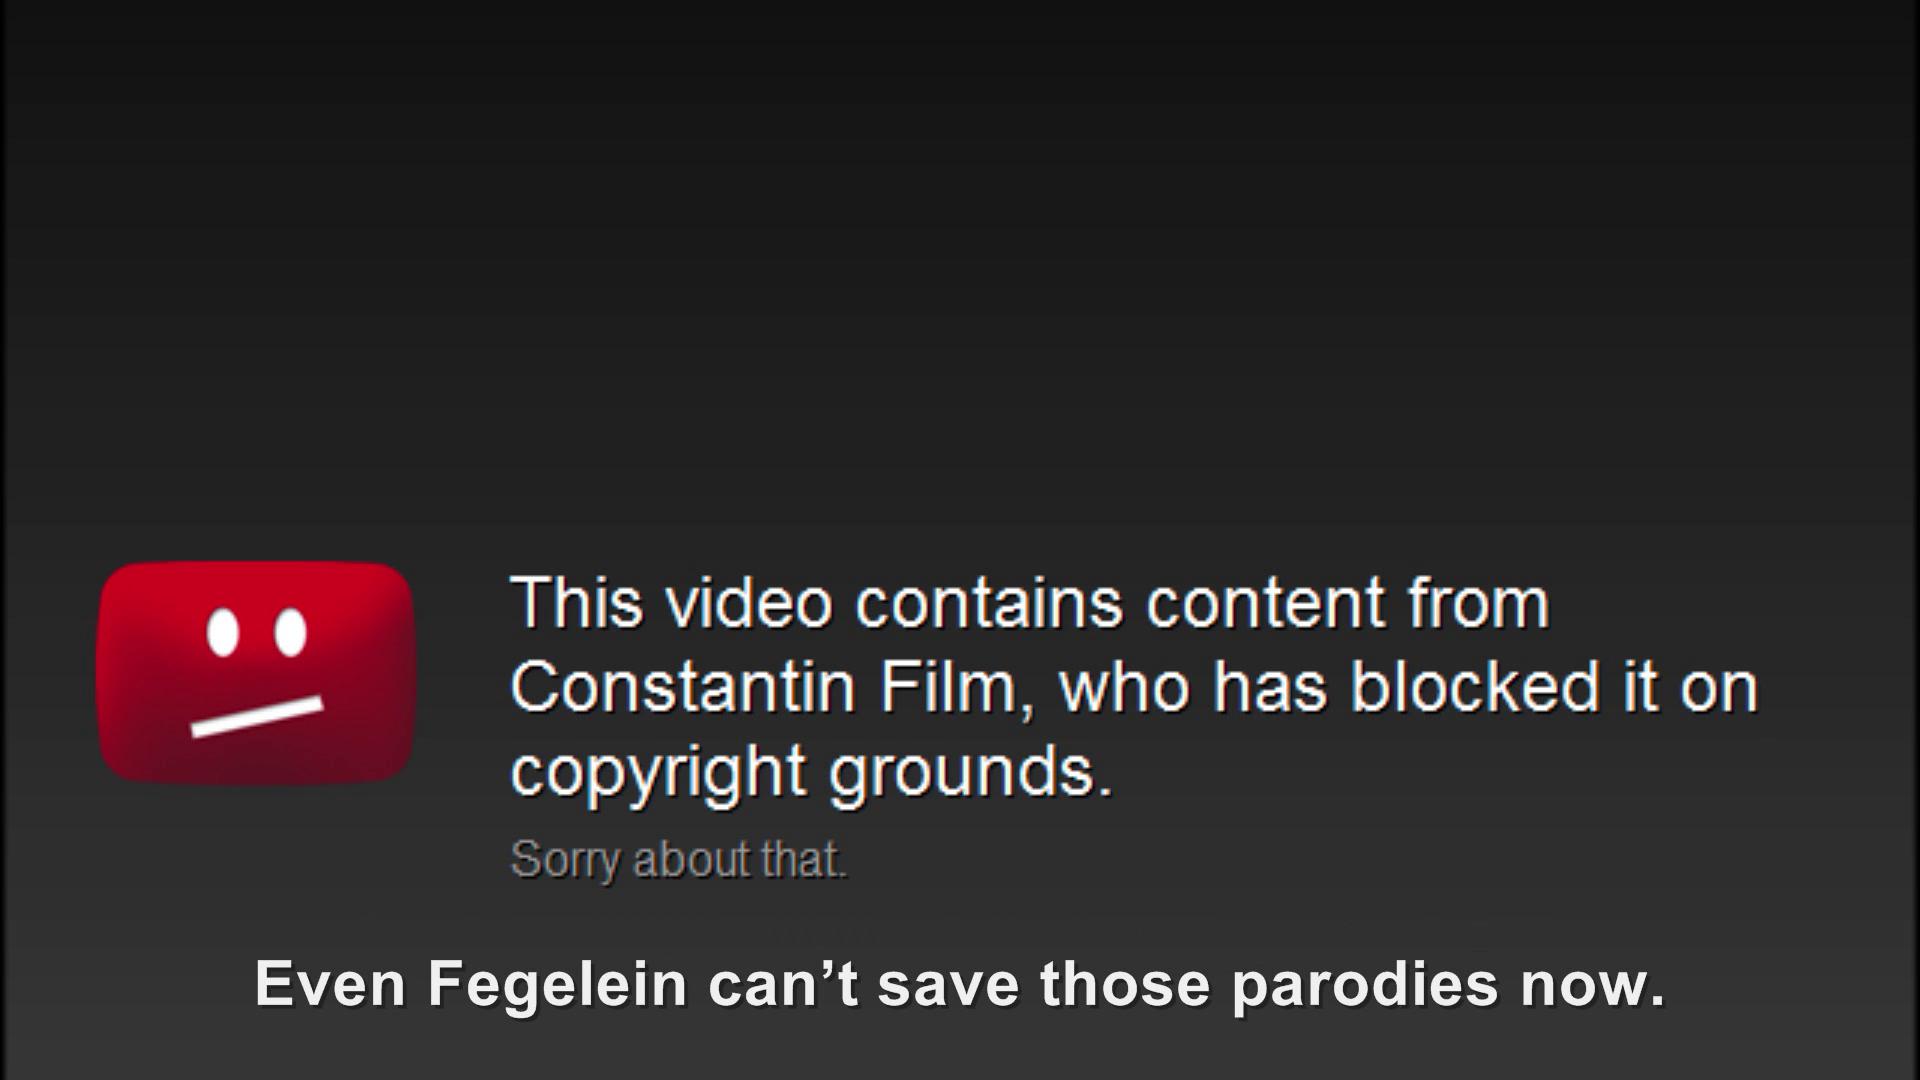 Hitler is informed Constantin is blocking parodies again ...